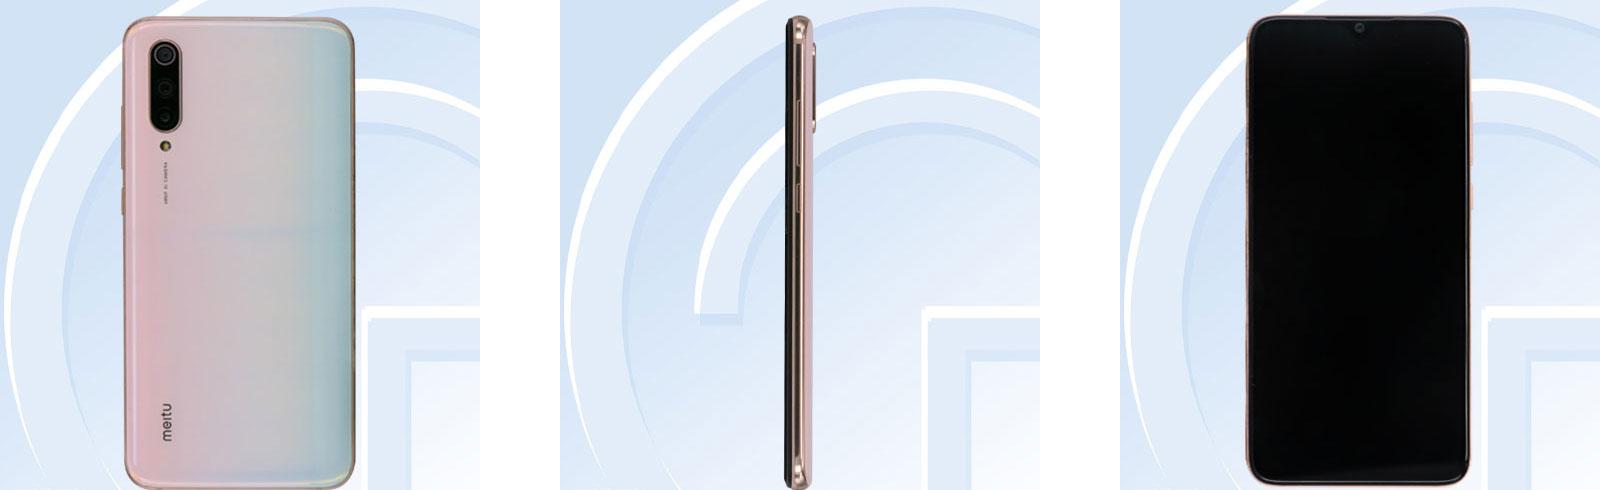 Xiaomi Mi CC9 and Mi CC9e specs confirmed by TENAA